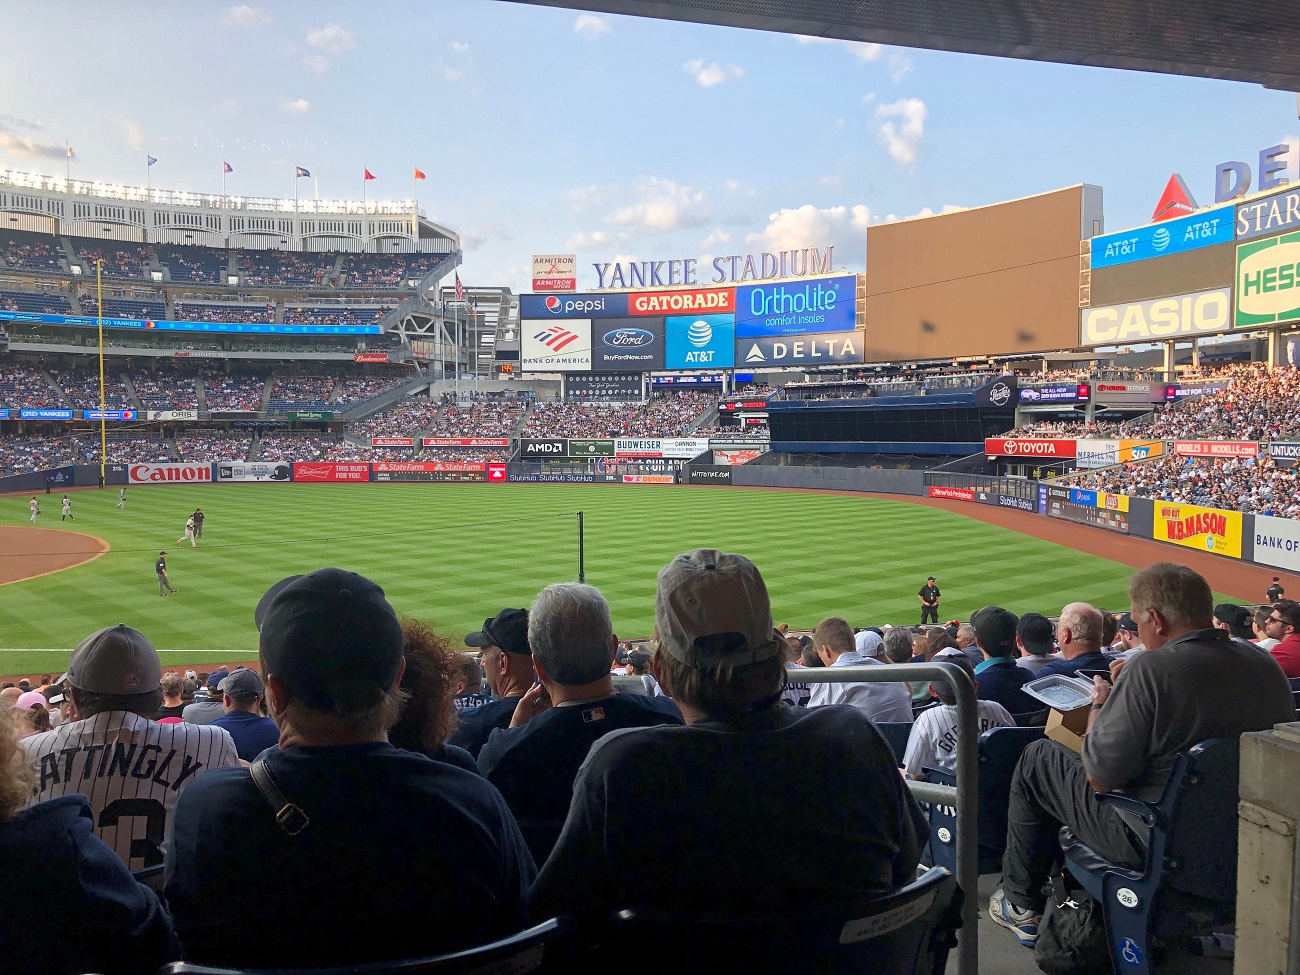 Section 112 at Yankee Stadium